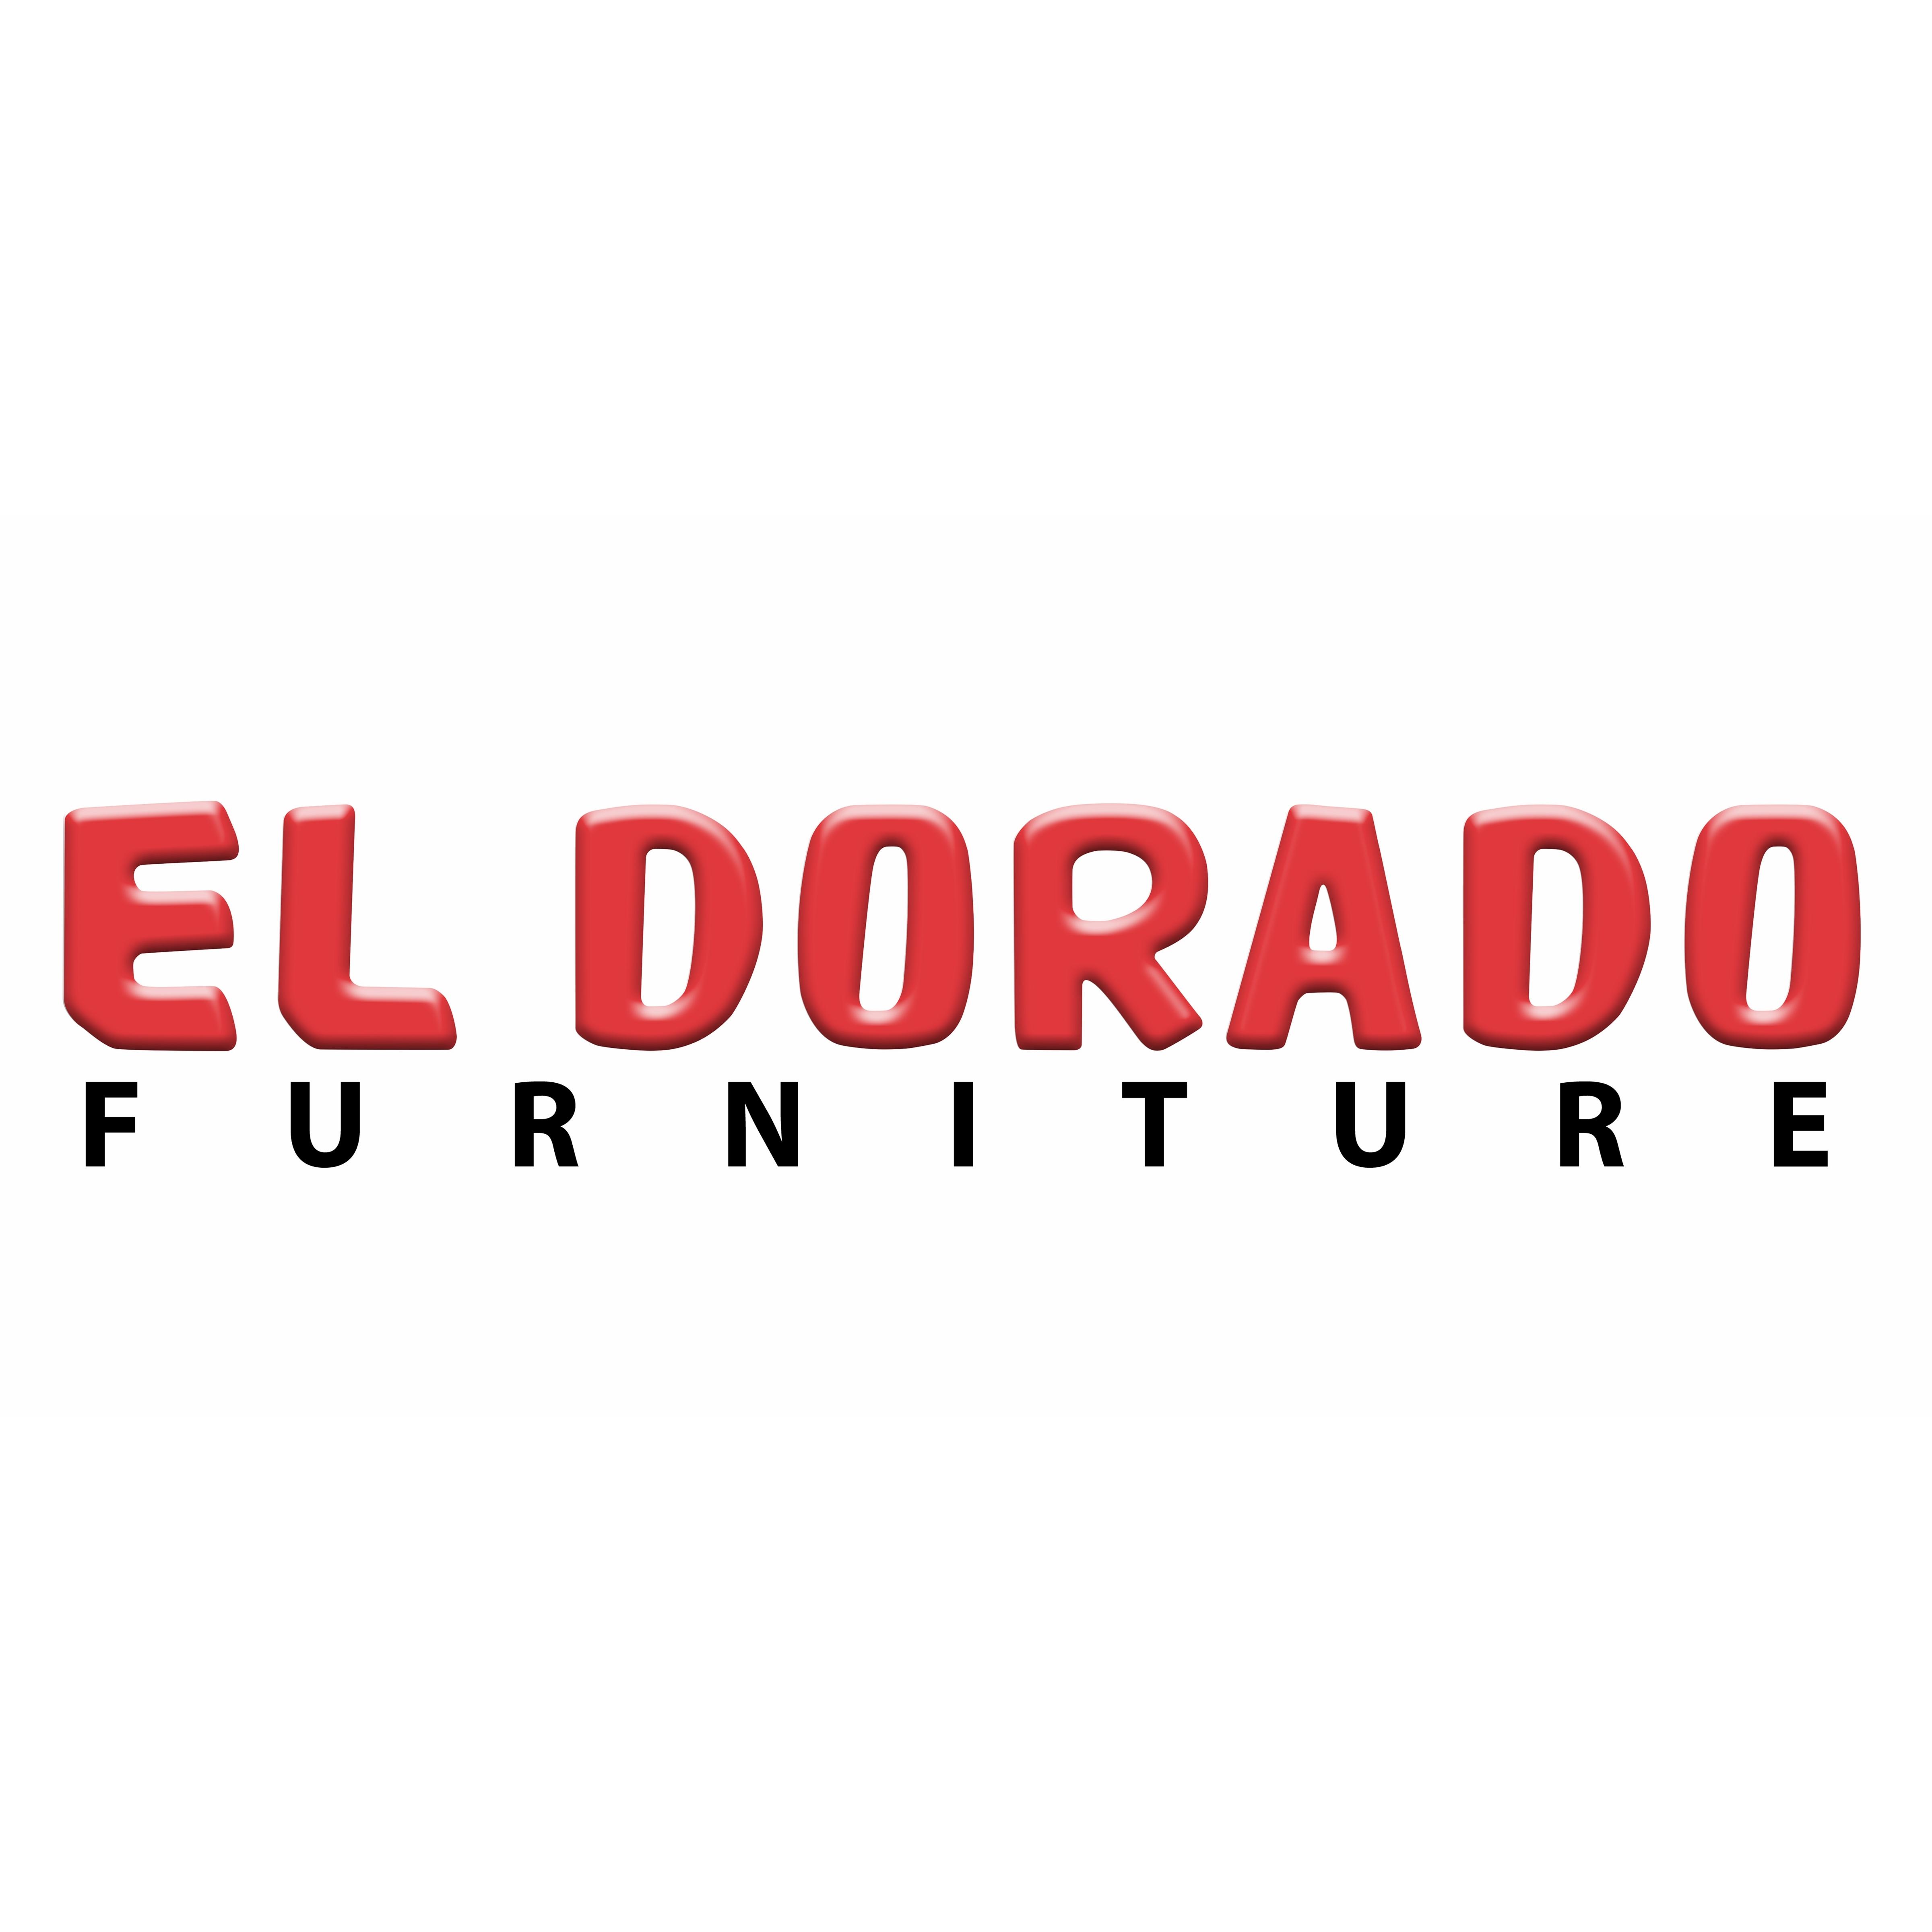 Premium benefits for el dorado furniture blucard® credit card holder: El Dorado Furniture - Fort Myers Boulevard - Fort Myers ...